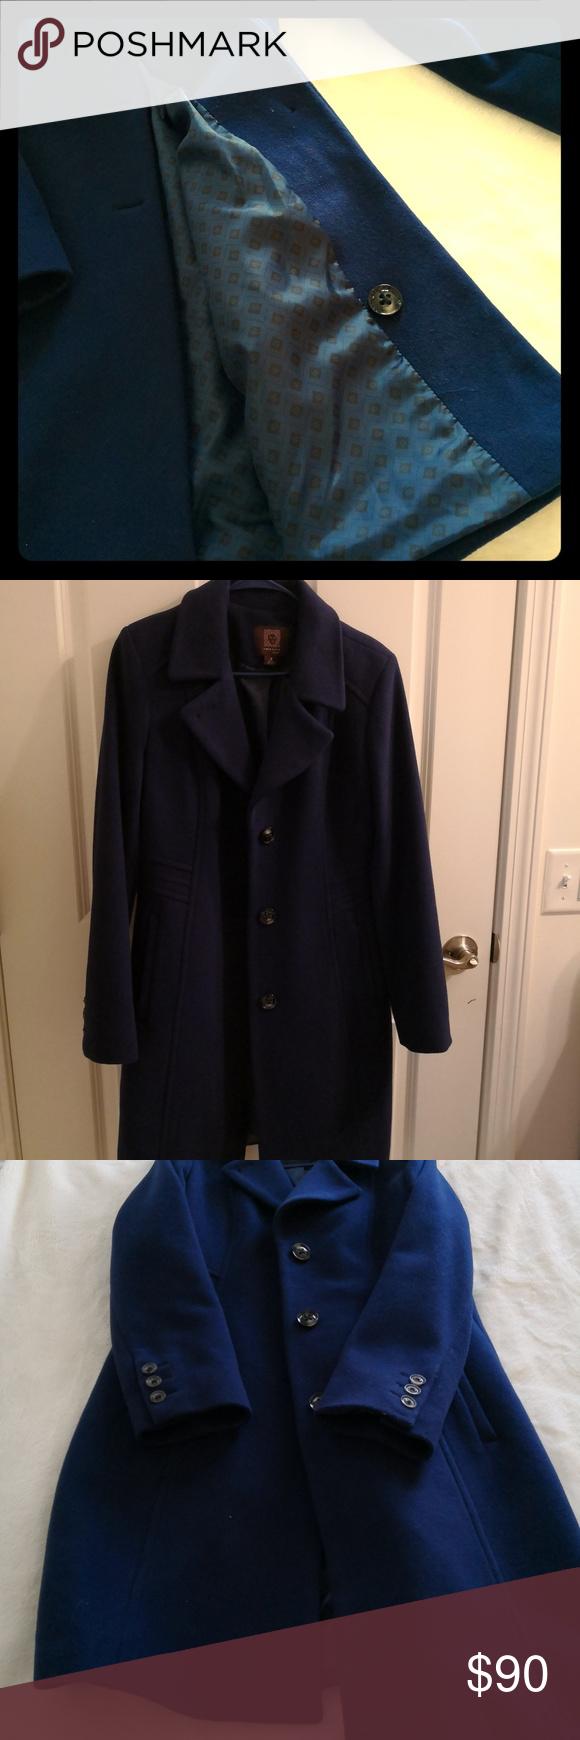 Anne klein overcoat size royal blue almost new anne klein